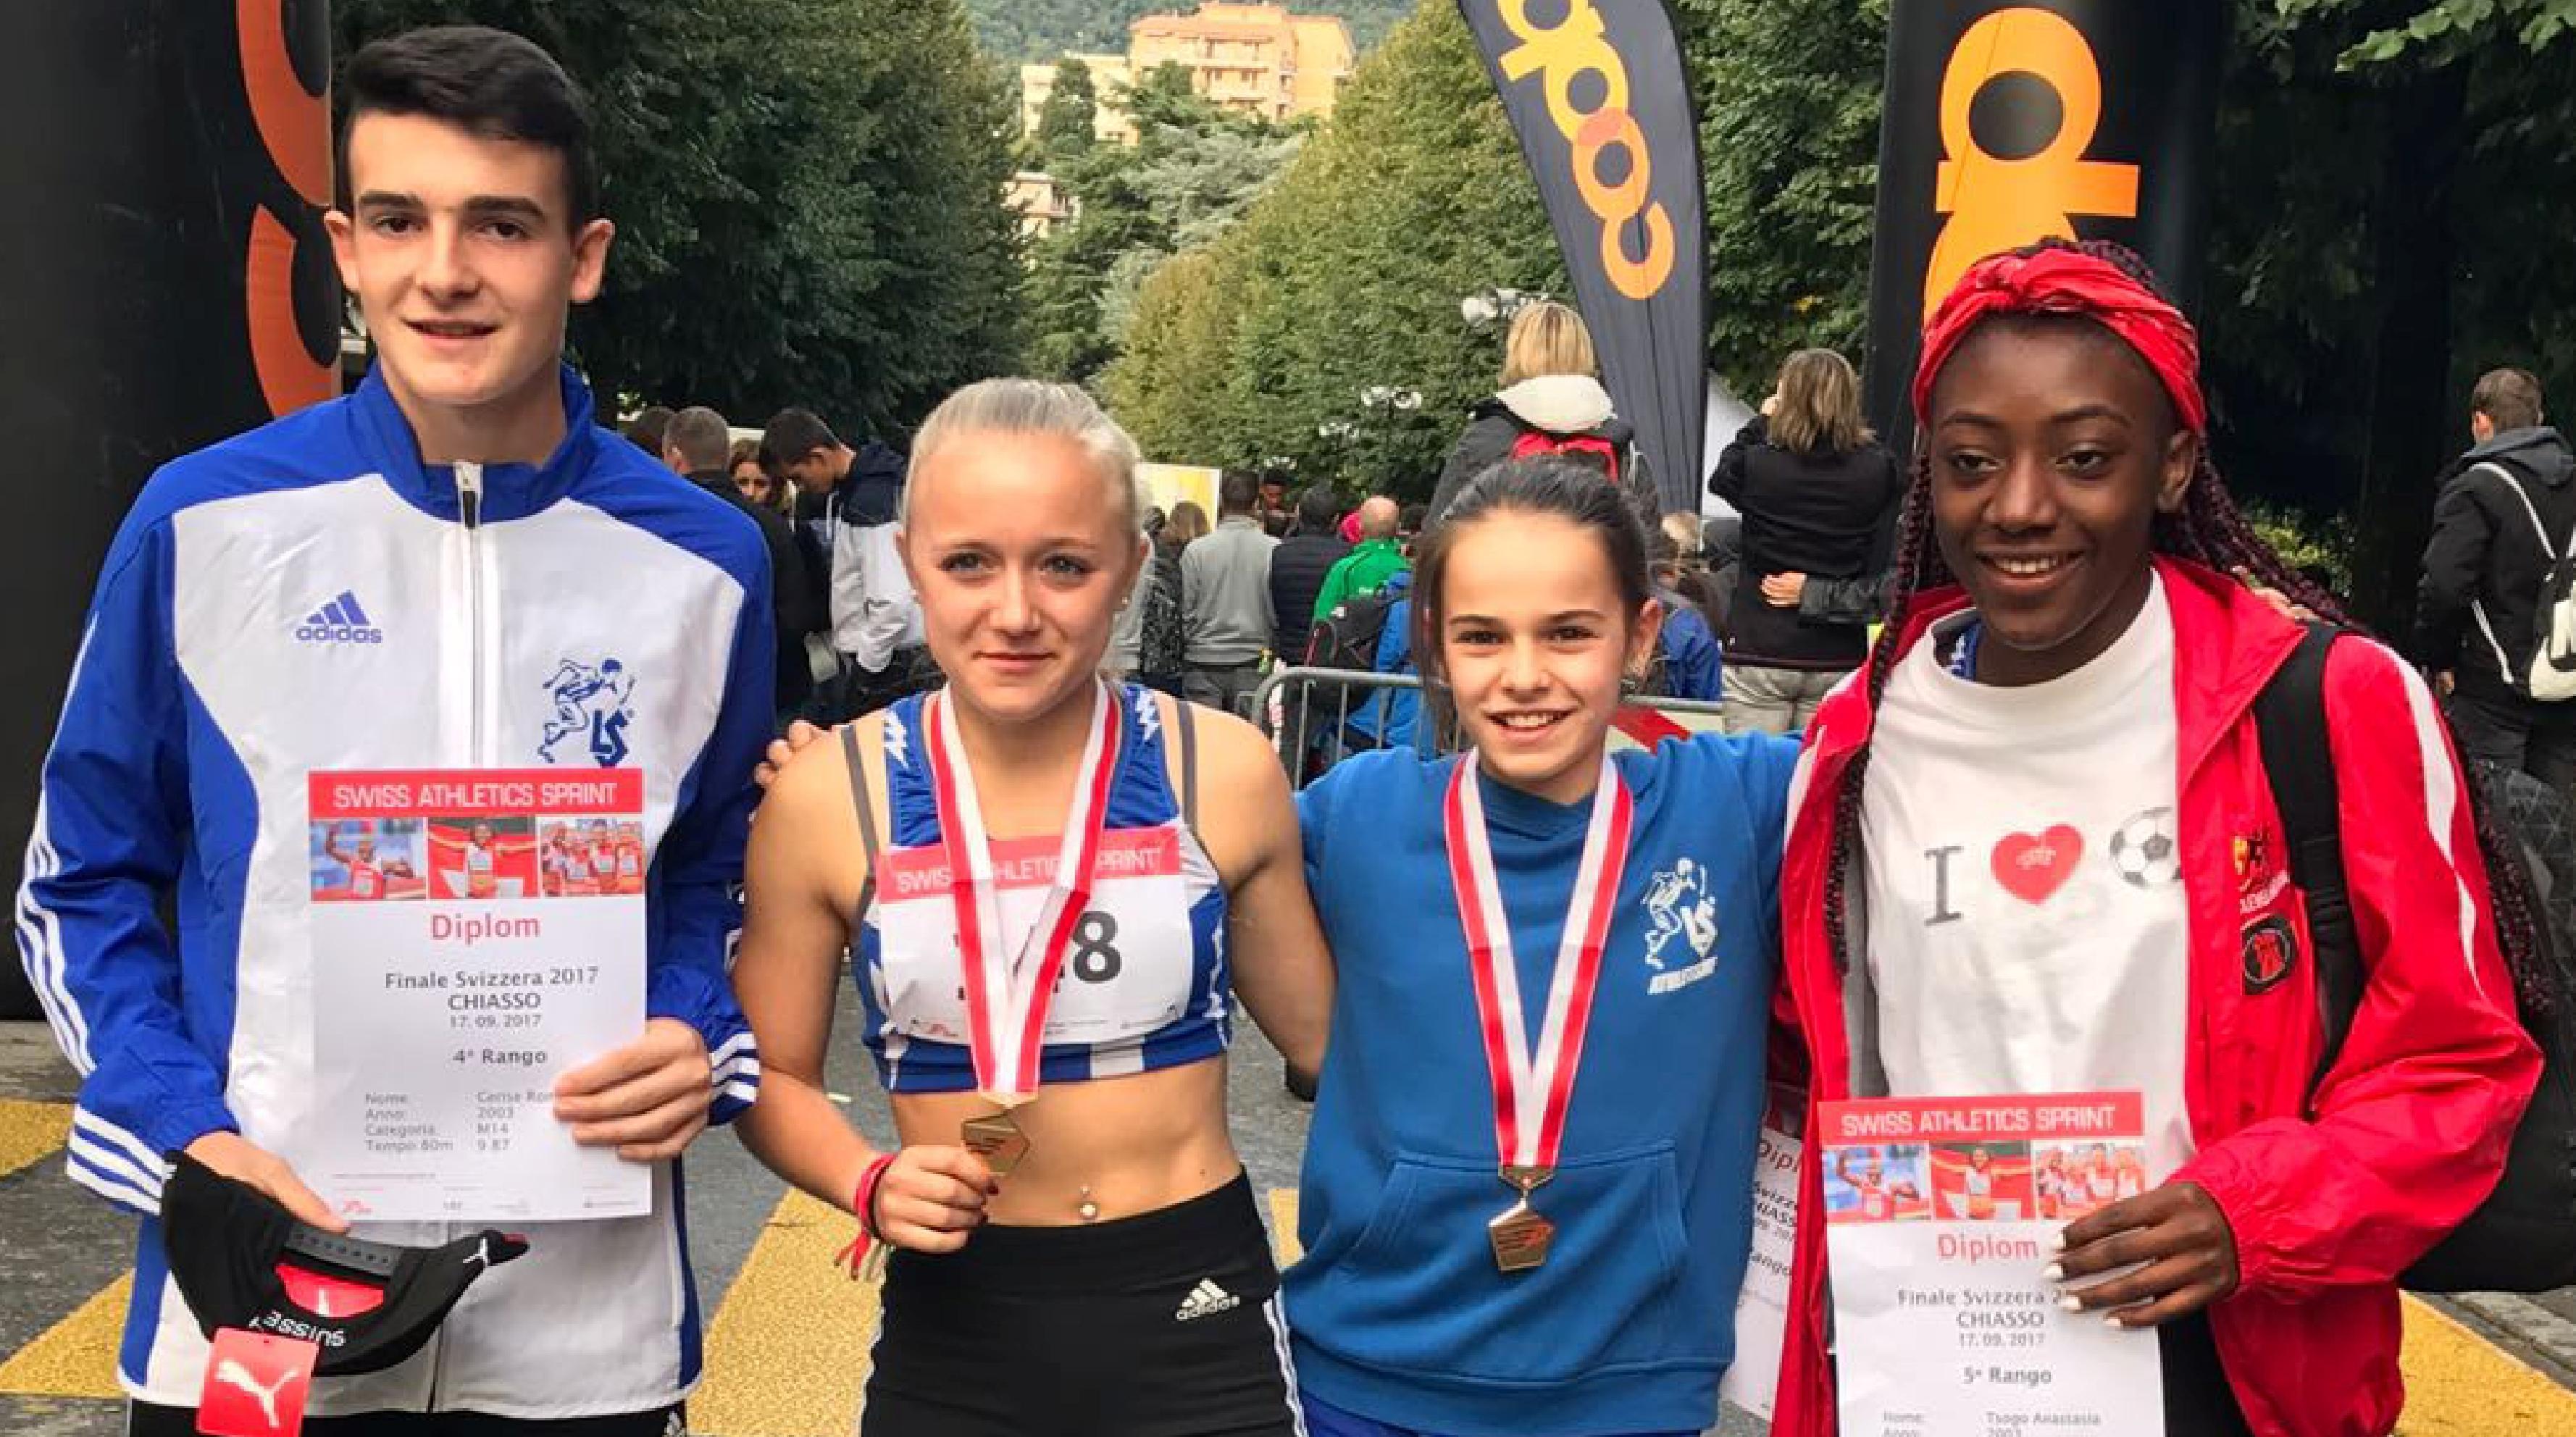 Swiss Athletics Sprint à Chiasso